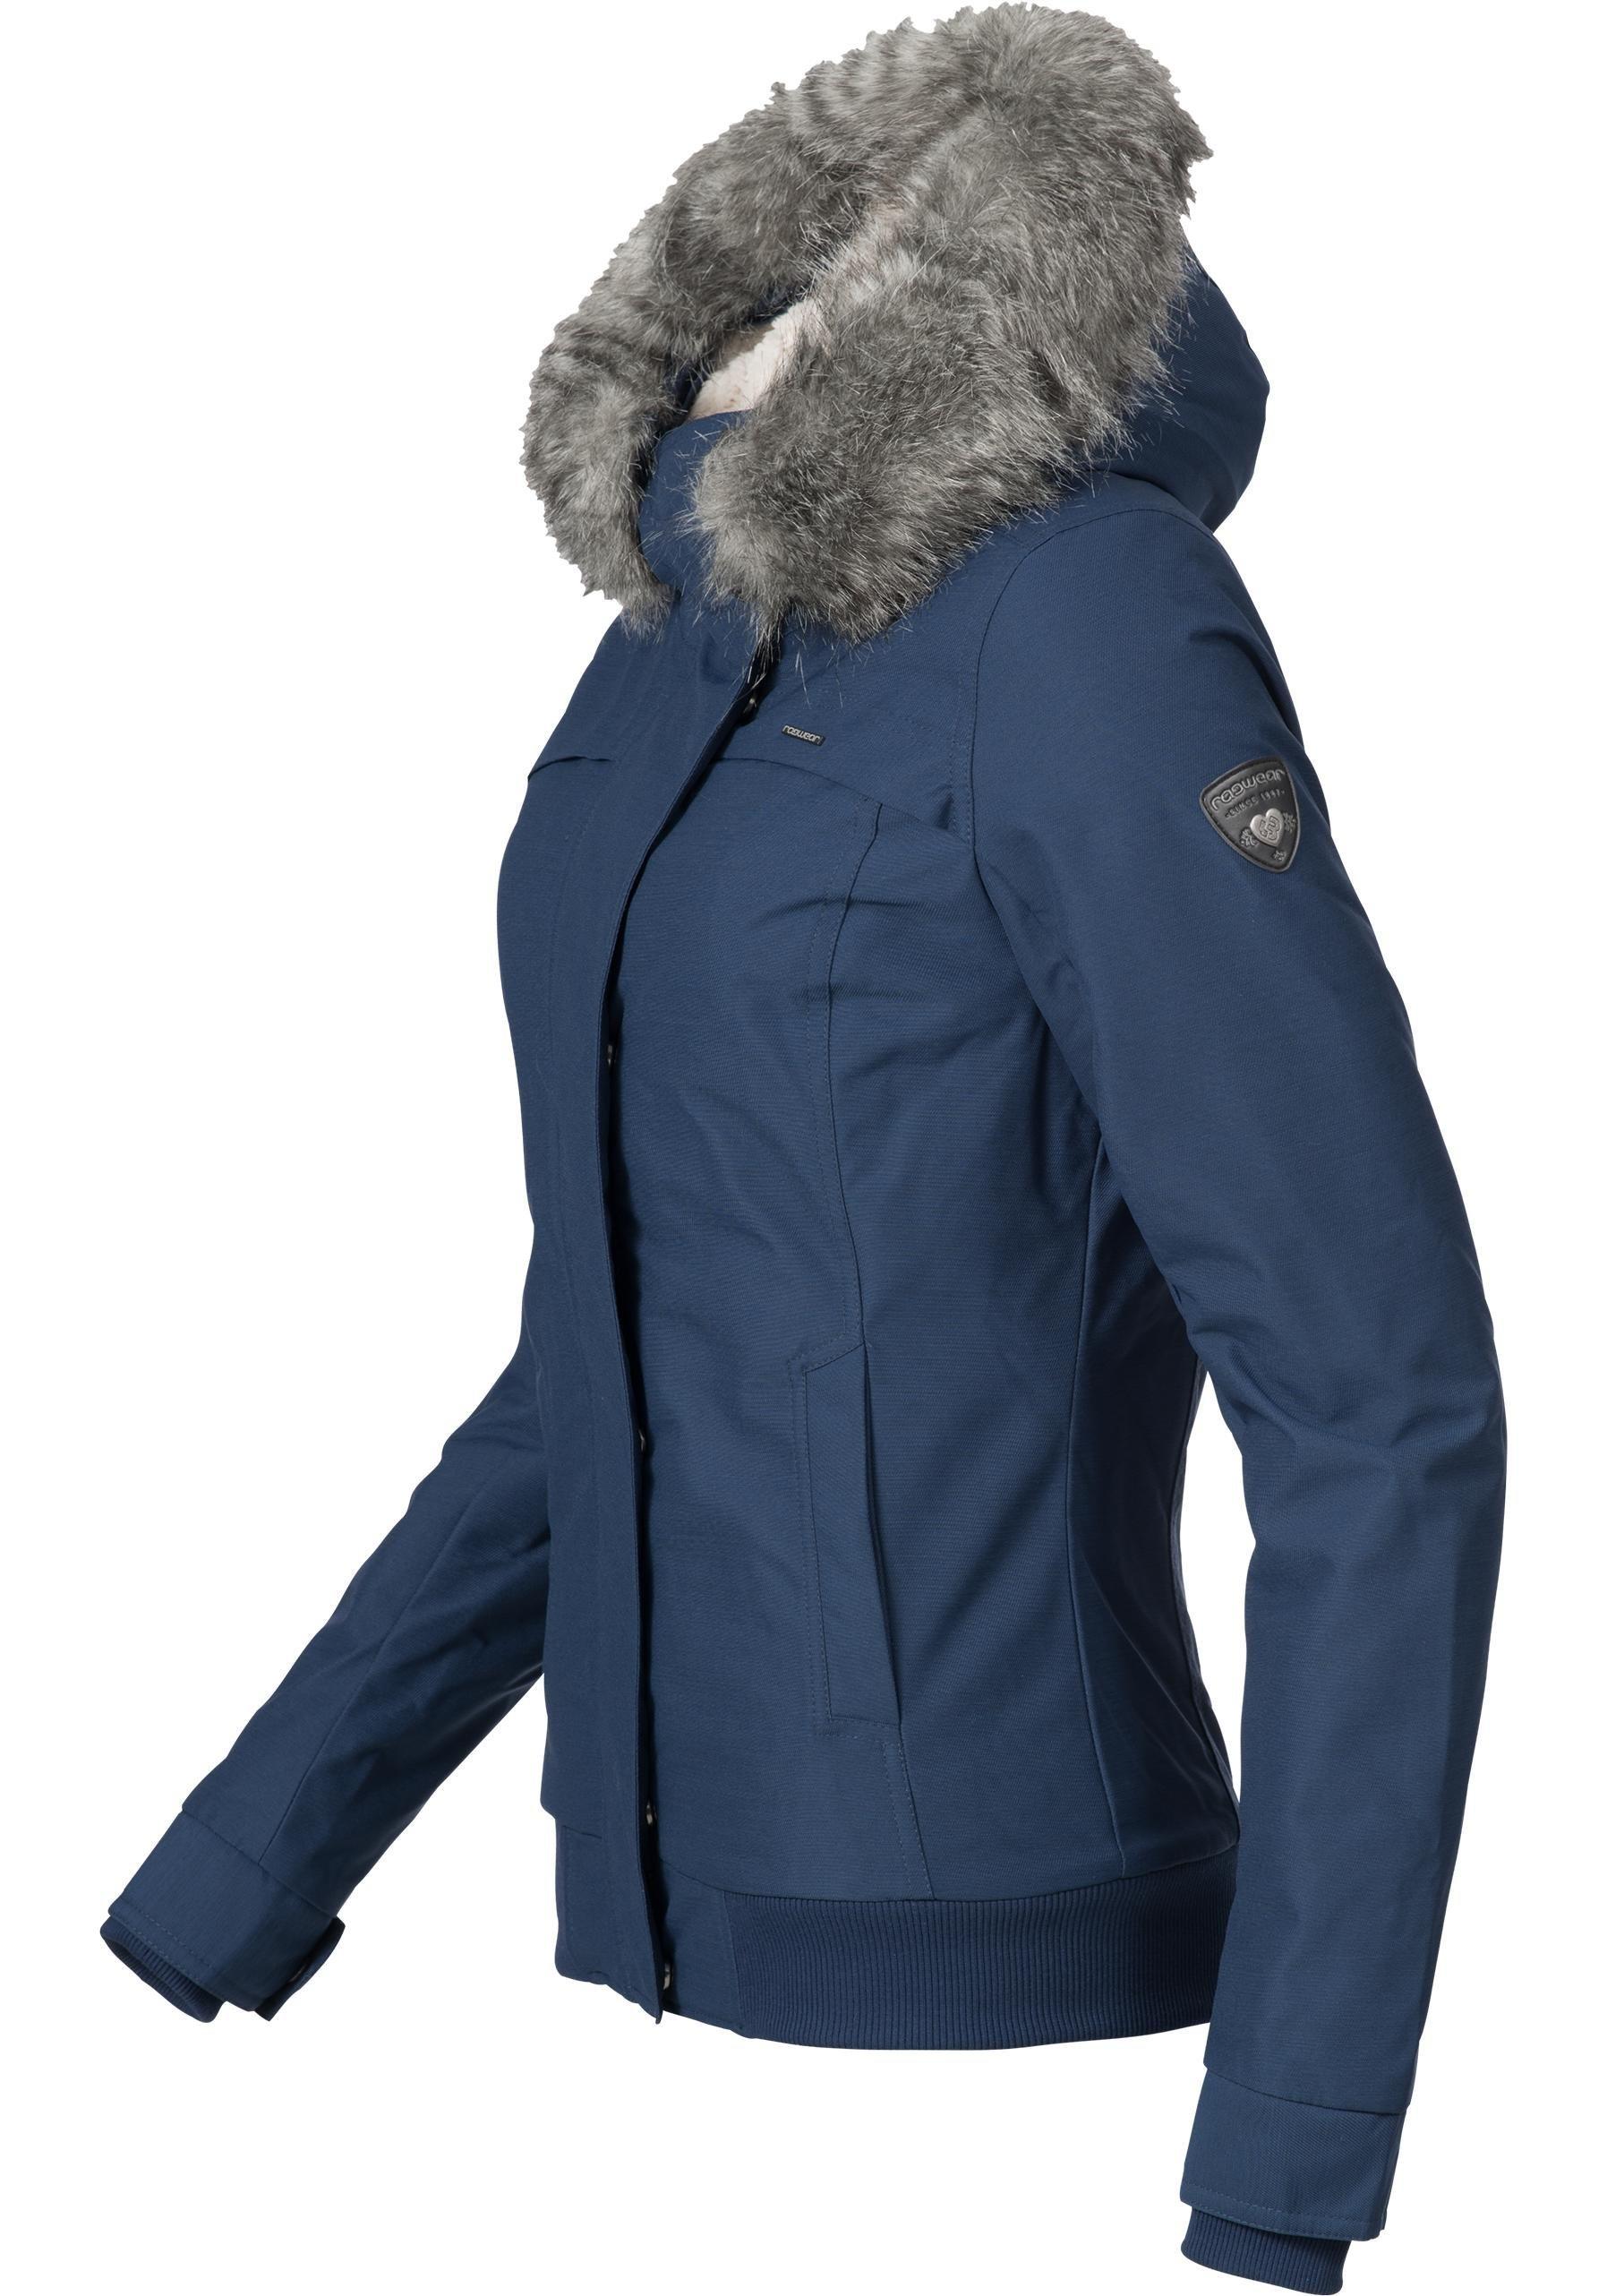 Damen Ragwear Winterjacke YM-Wooki Basicjacke mit Teddyfell und Kunstpelz-Kapuze blau | 04251490104105